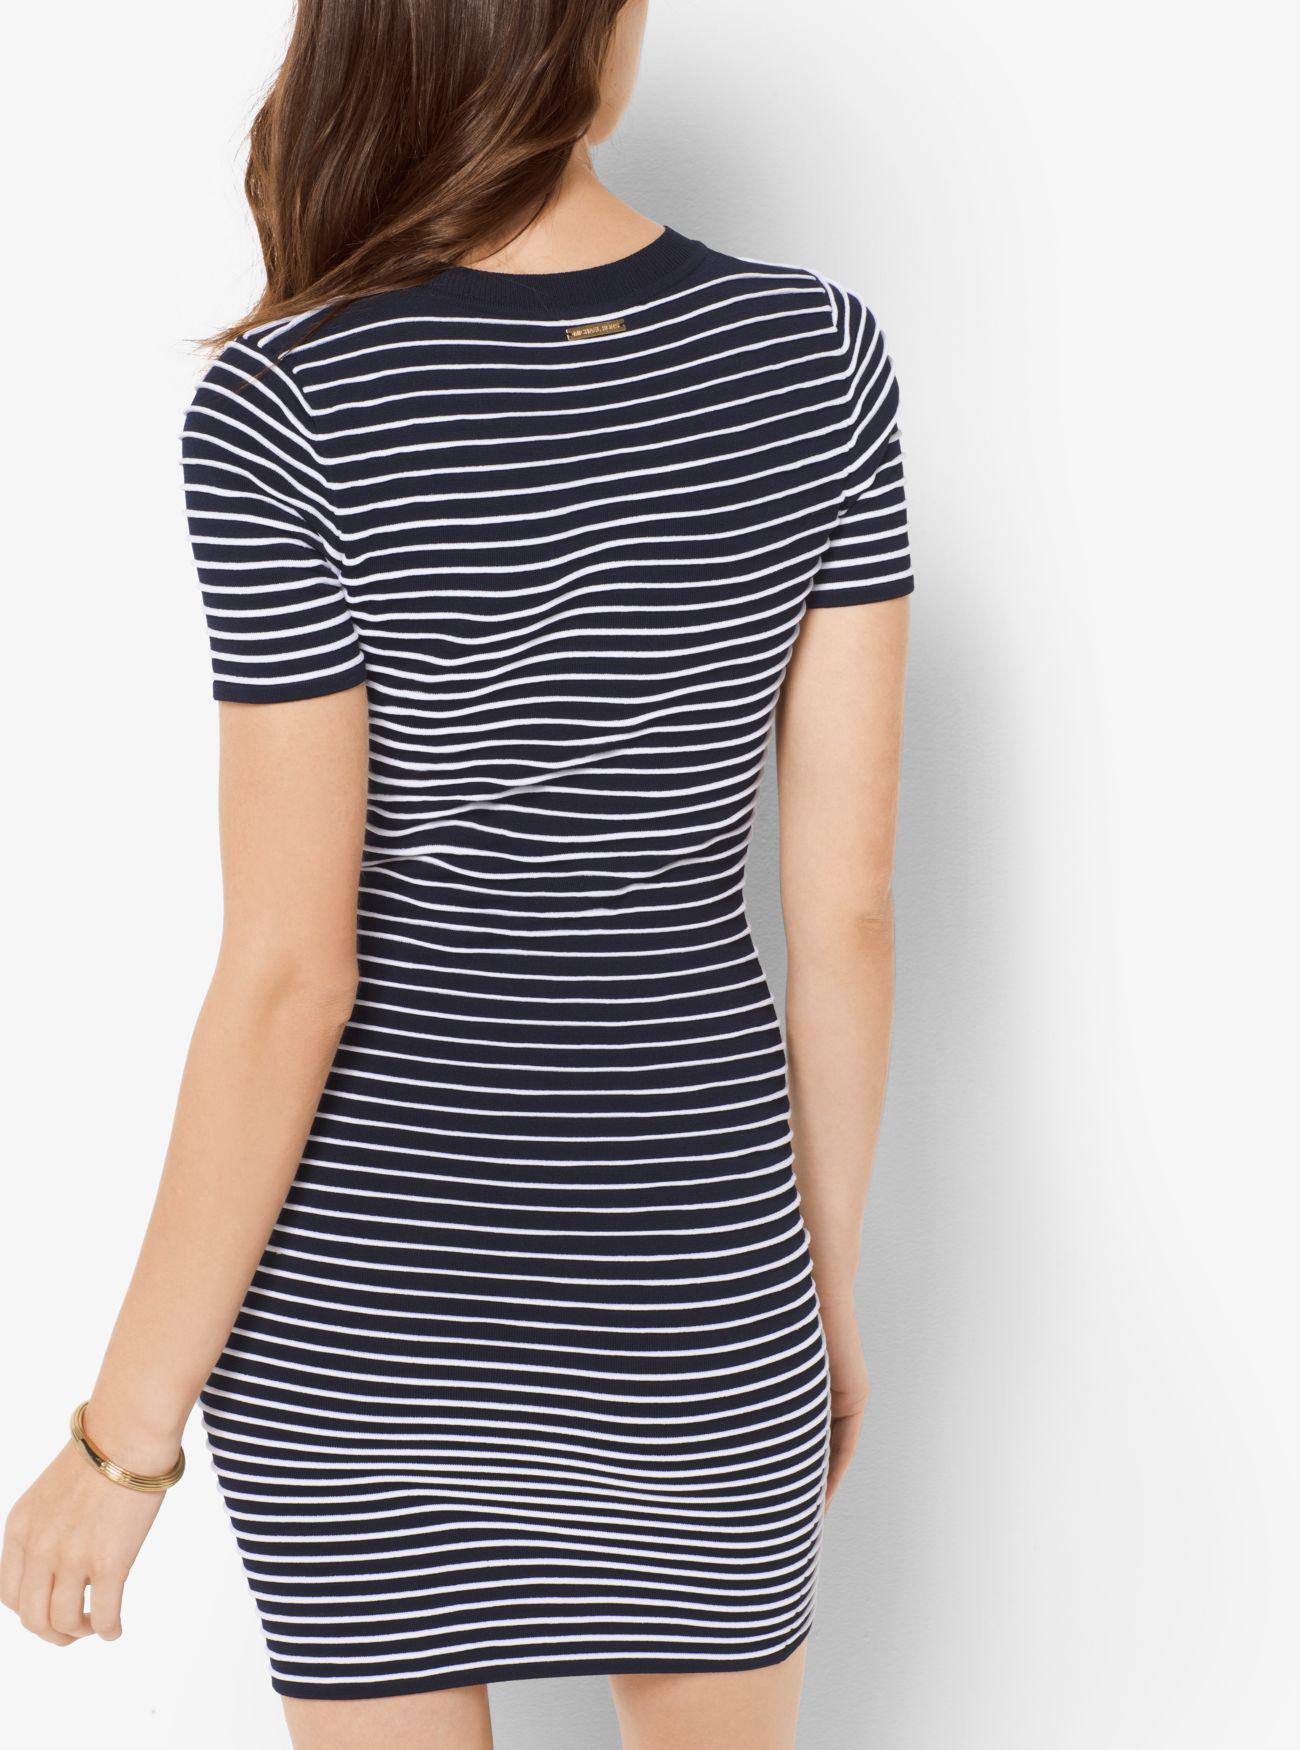 michael kors striped t shirt dress